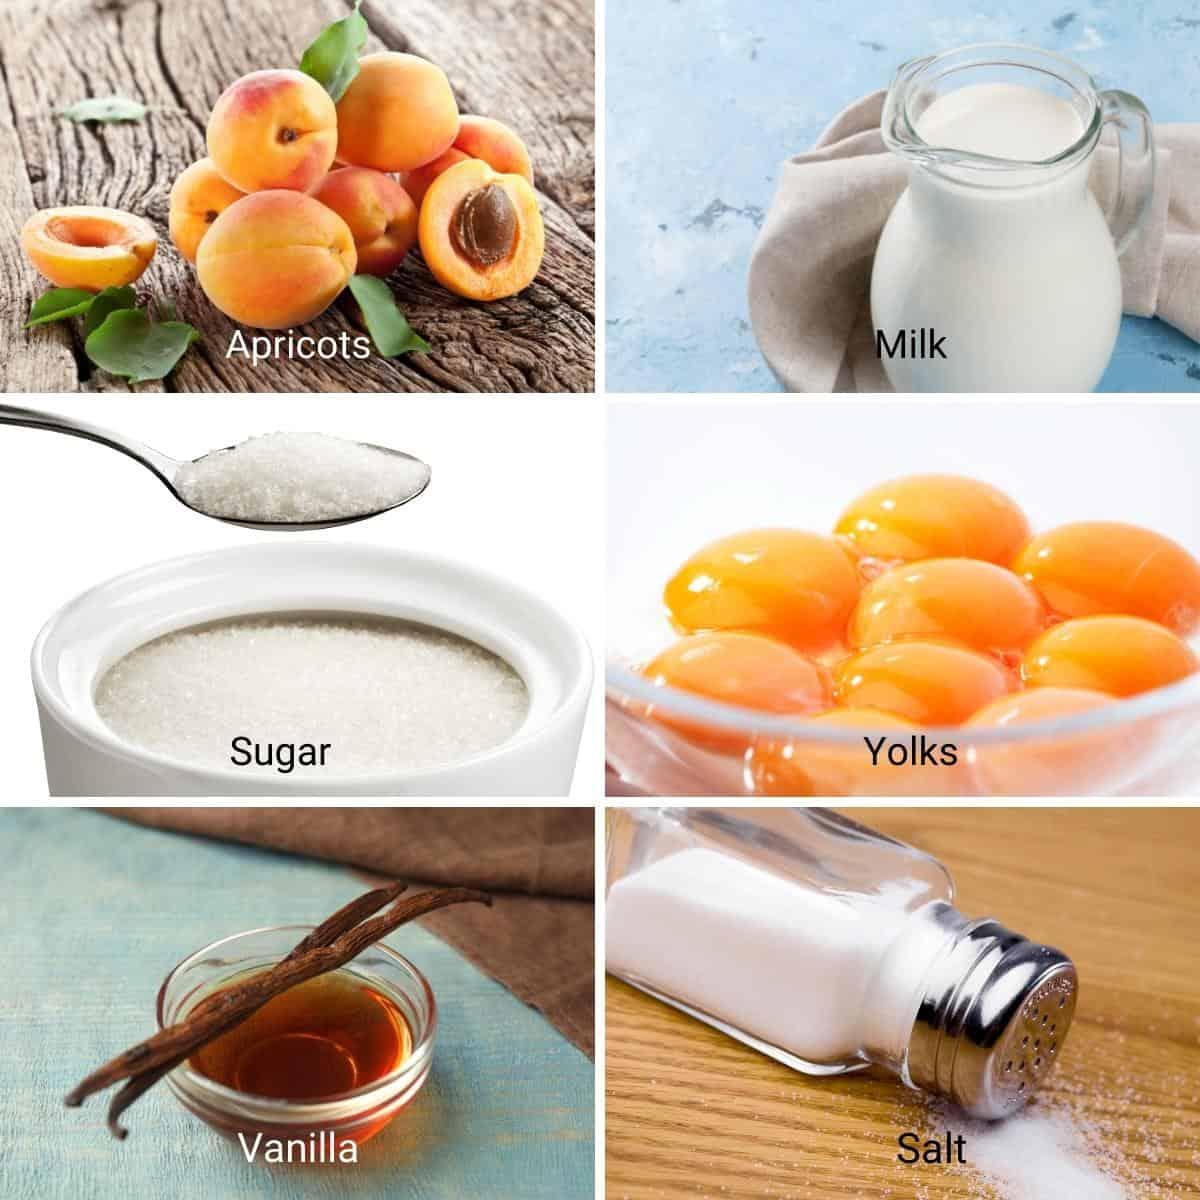 Ingredients for making apricot flan.